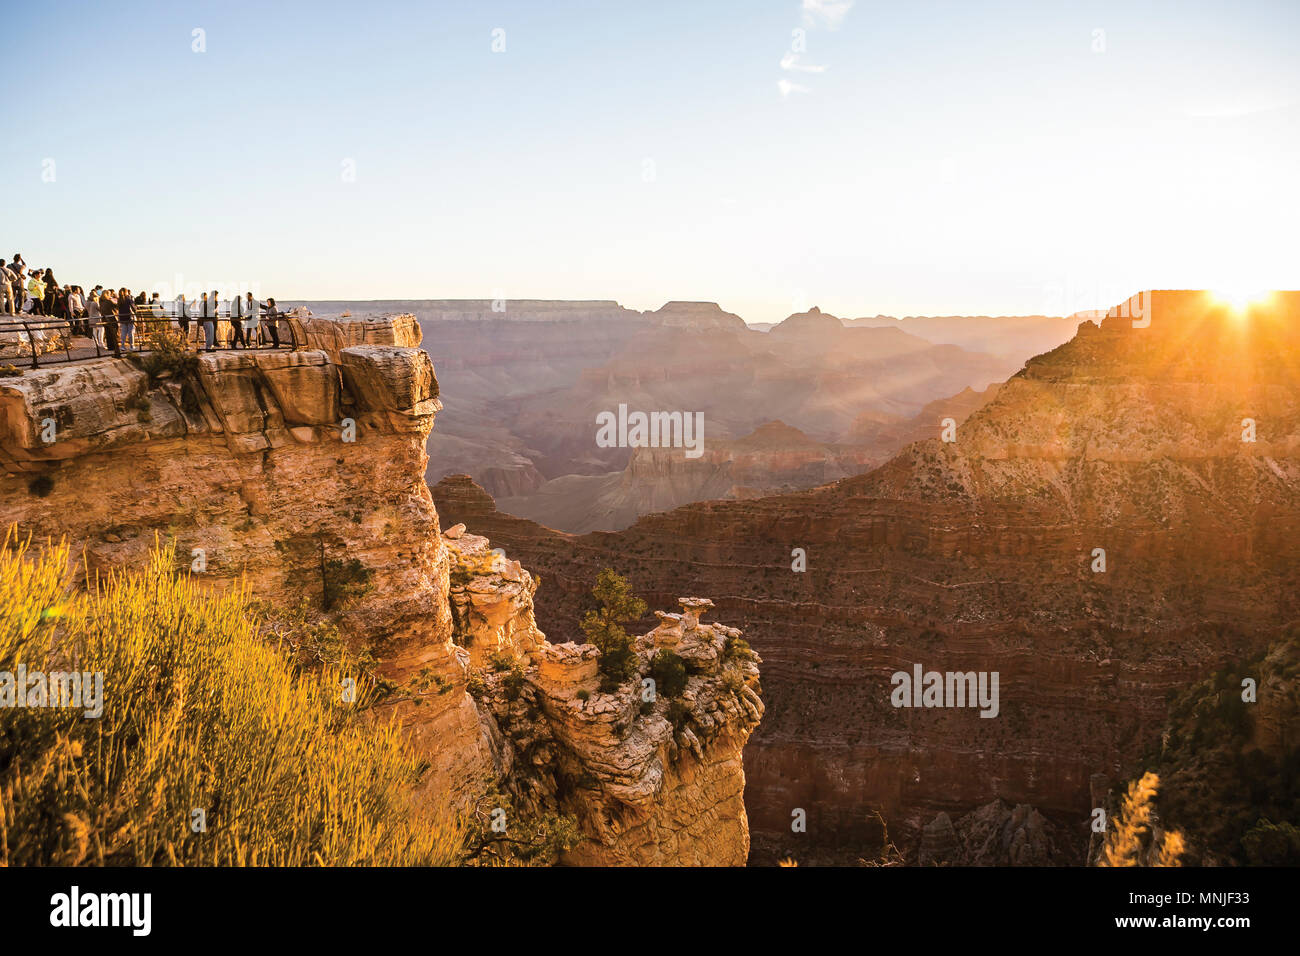 Majestic View mit Touristen beobachten Sonnenaufgang über North Rim des Grand Canyon National Park von Mathers Point am South Rim, Arizona, USA Stockfoto